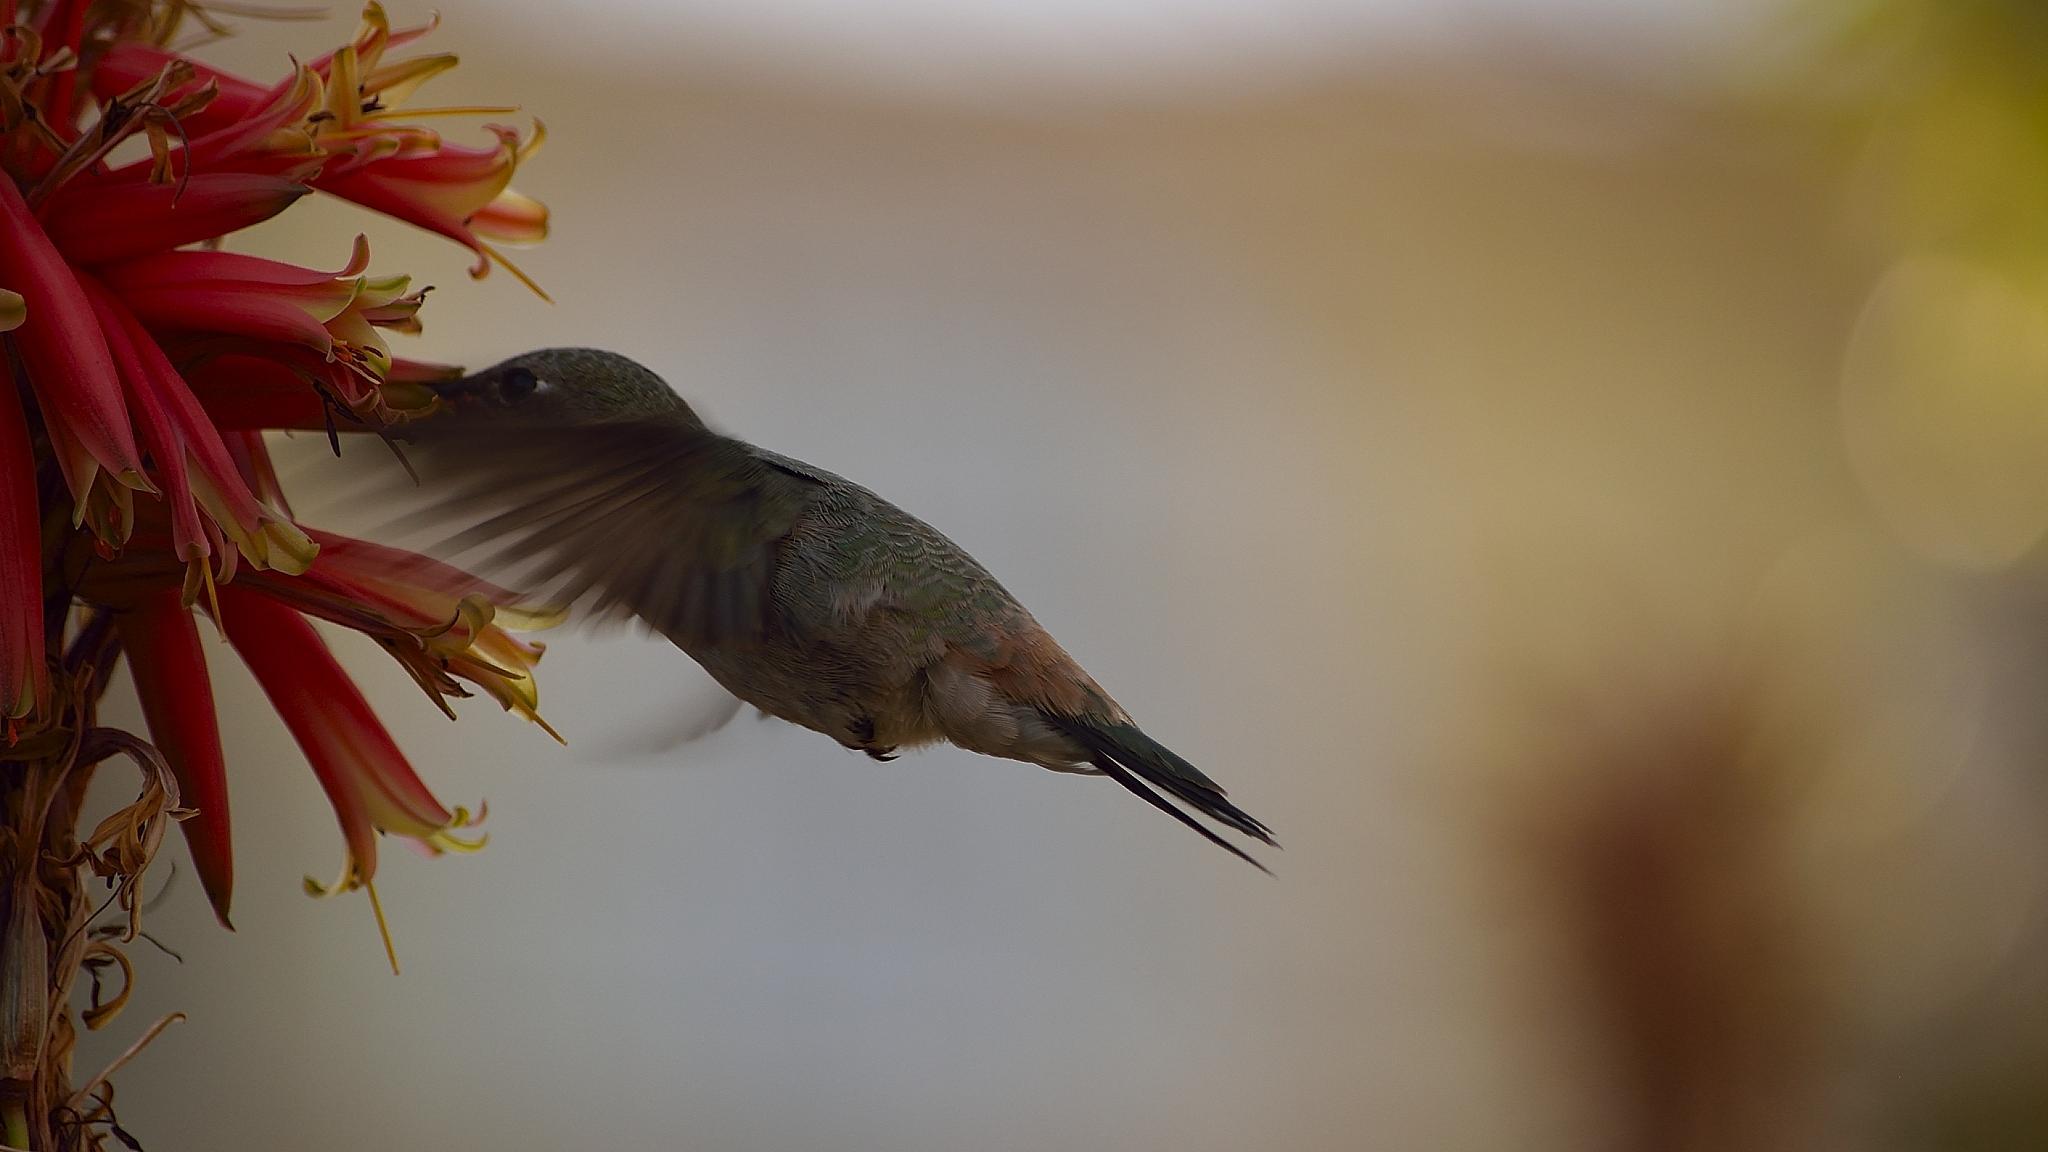 Hummingbirds and aloe vera (14) by milualin2006